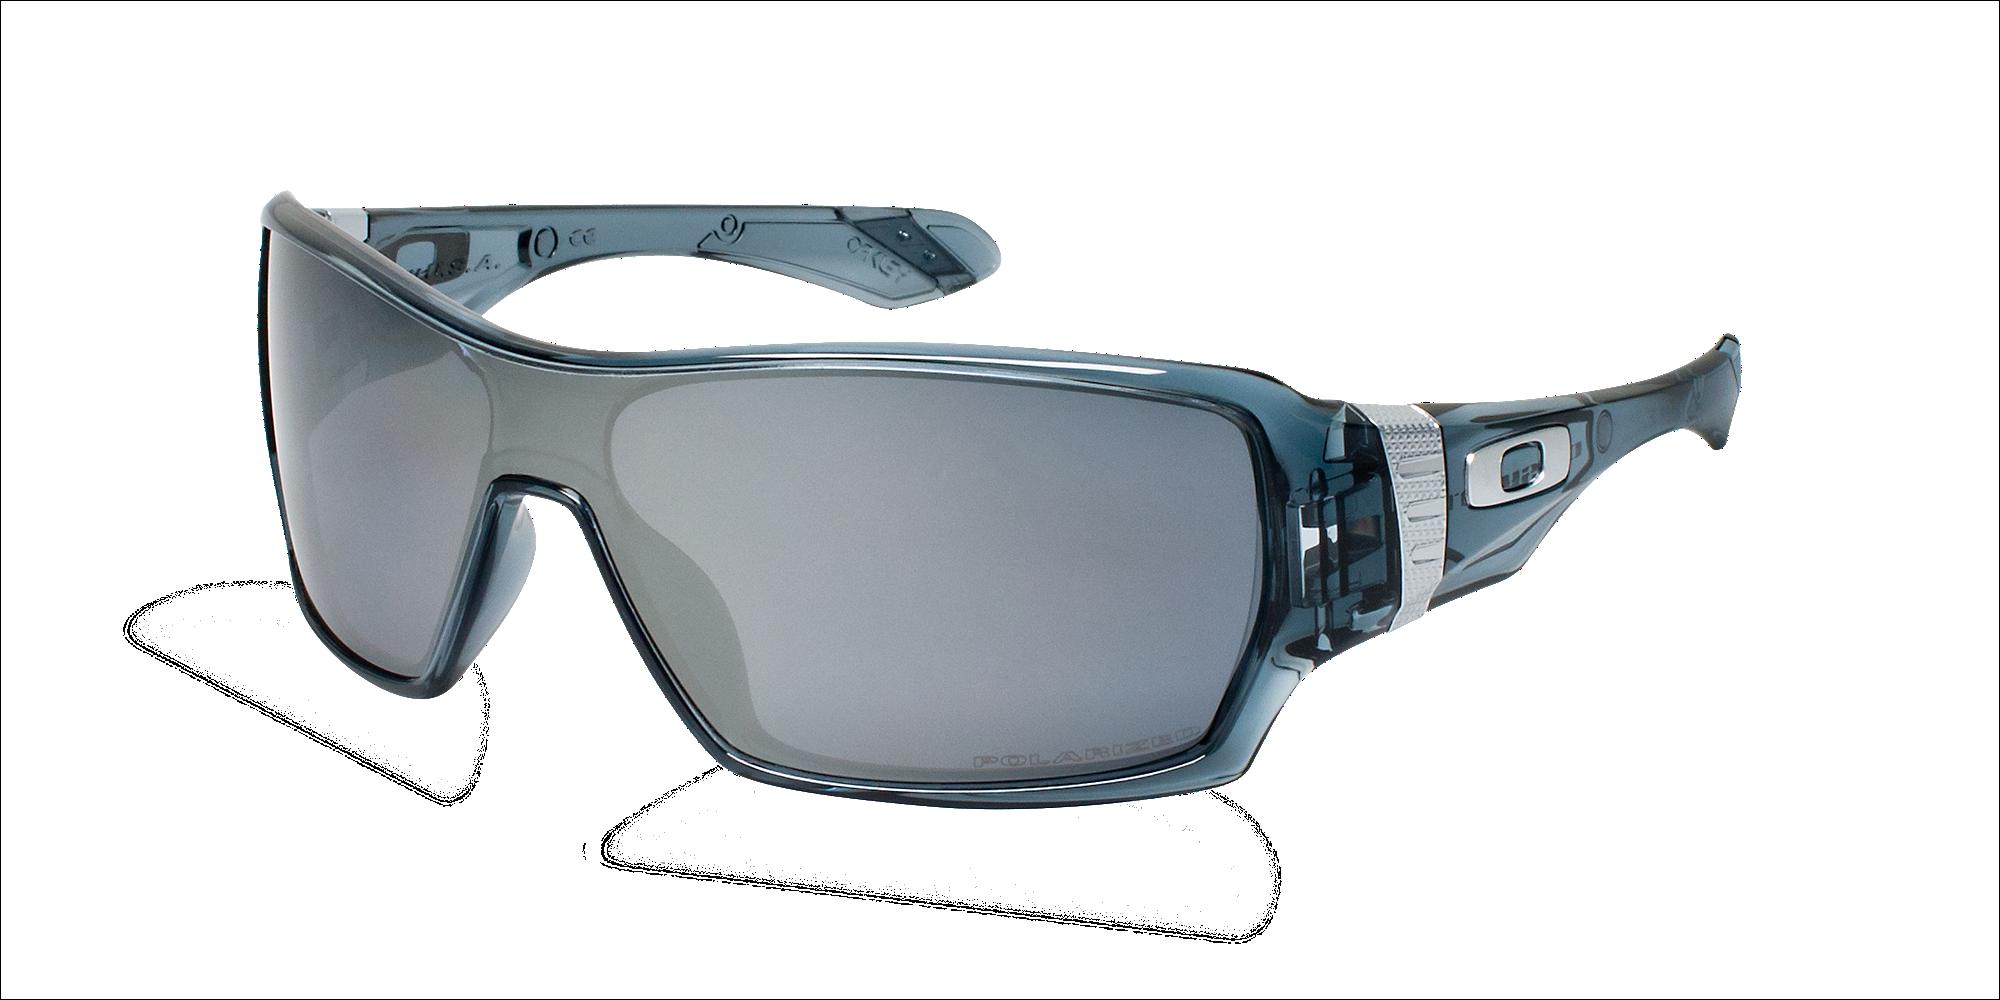 best place to buy oakley sunglasses 8gv2  best place to buy oakley sunglasses